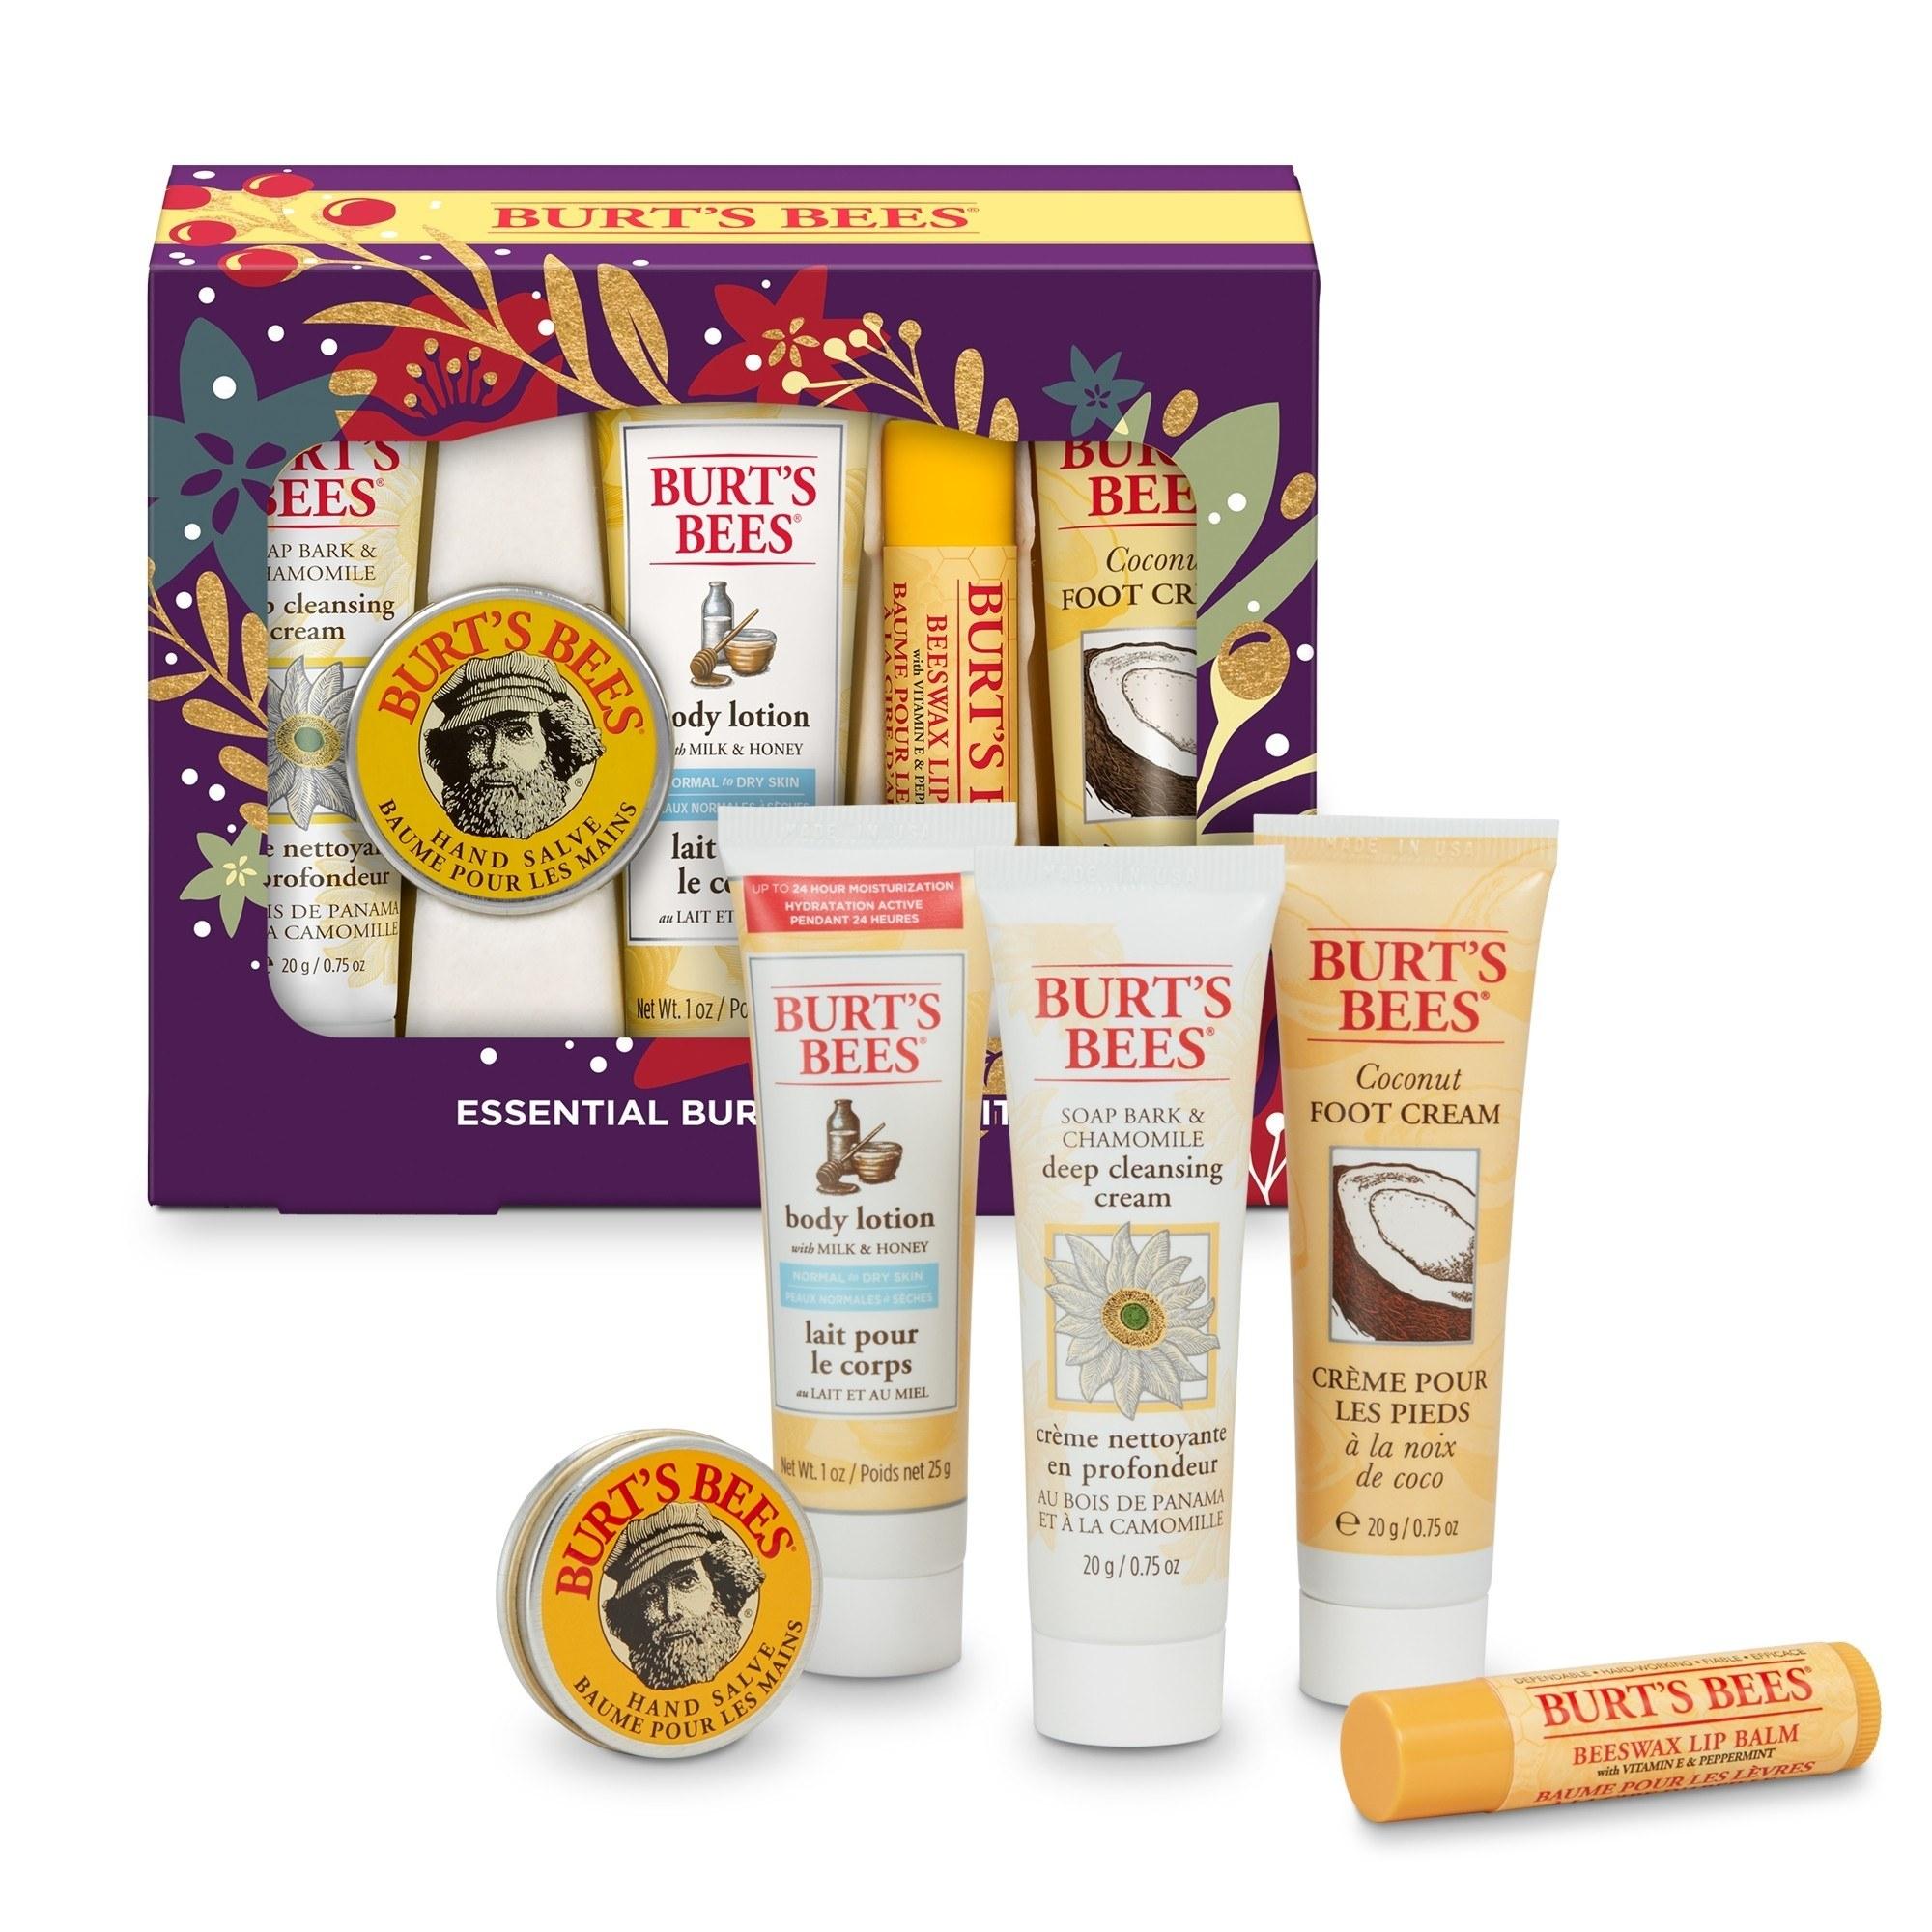 The Burt's Bees essentials kit